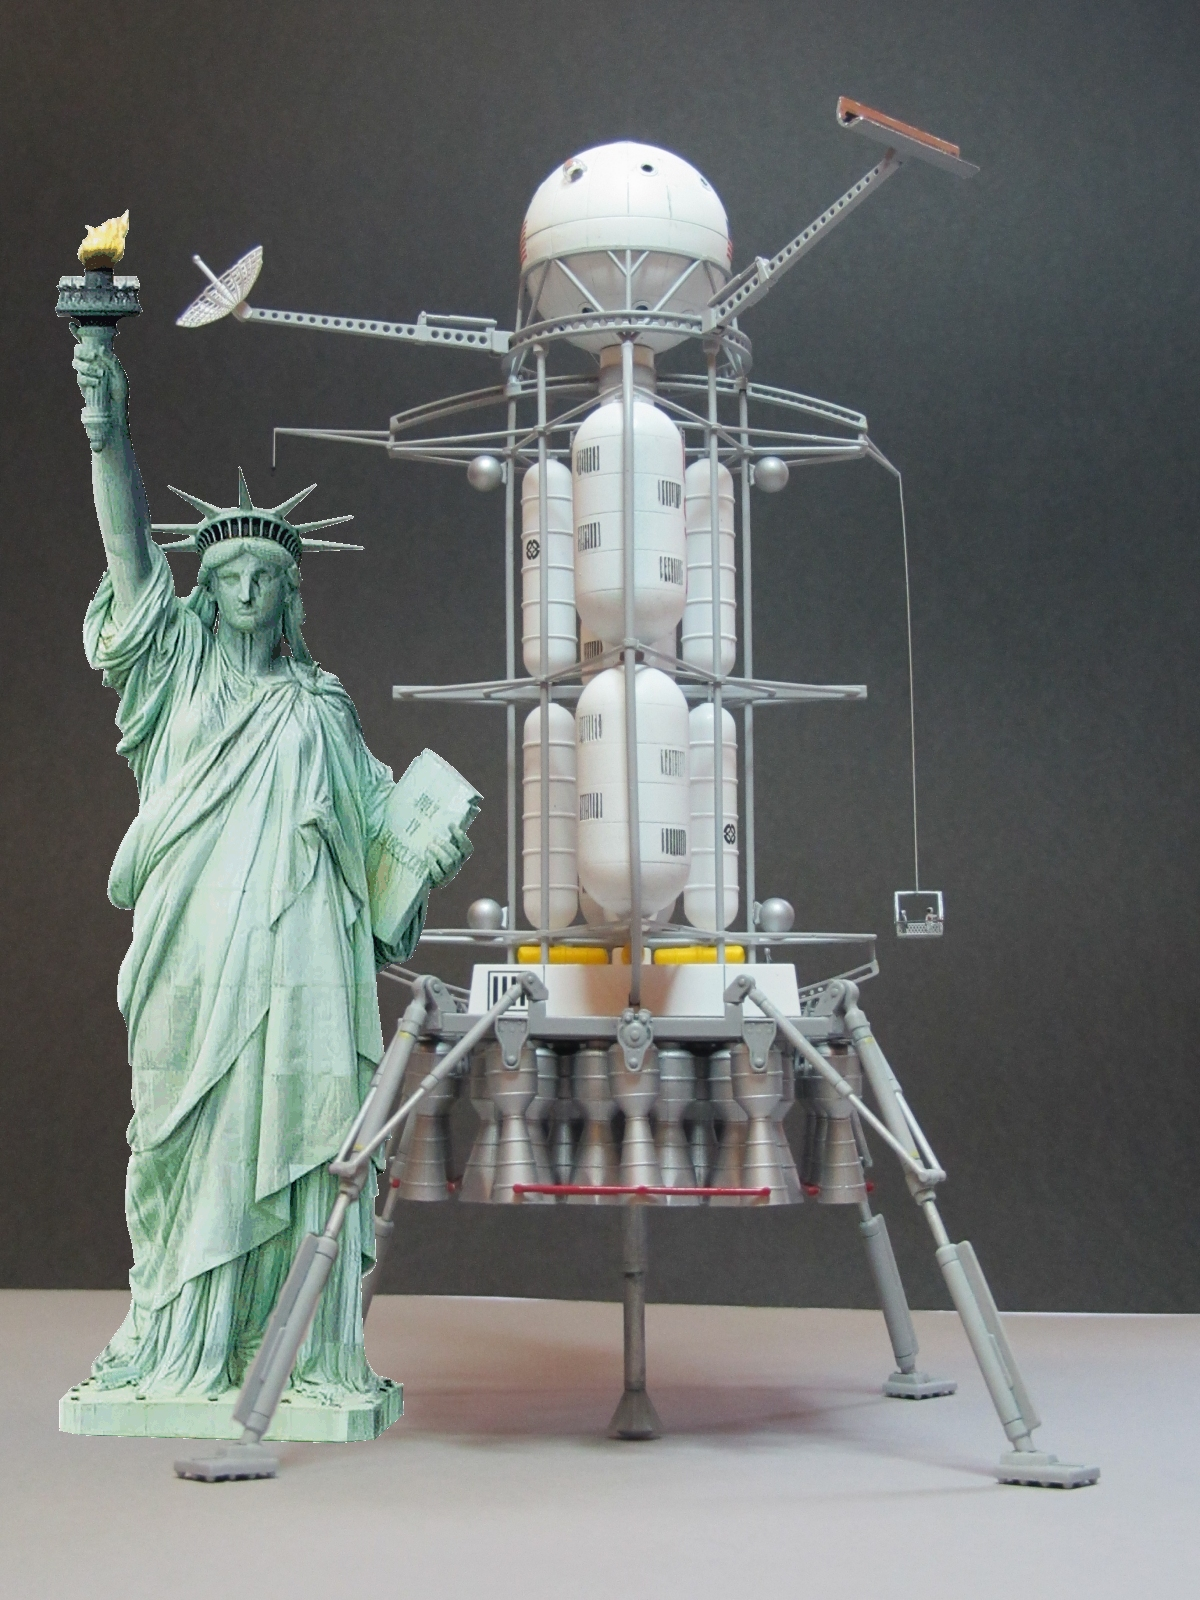 Click image for larger version.  Name:liberty lander.jpg Views:20 Size:1.04 MB ID:24561